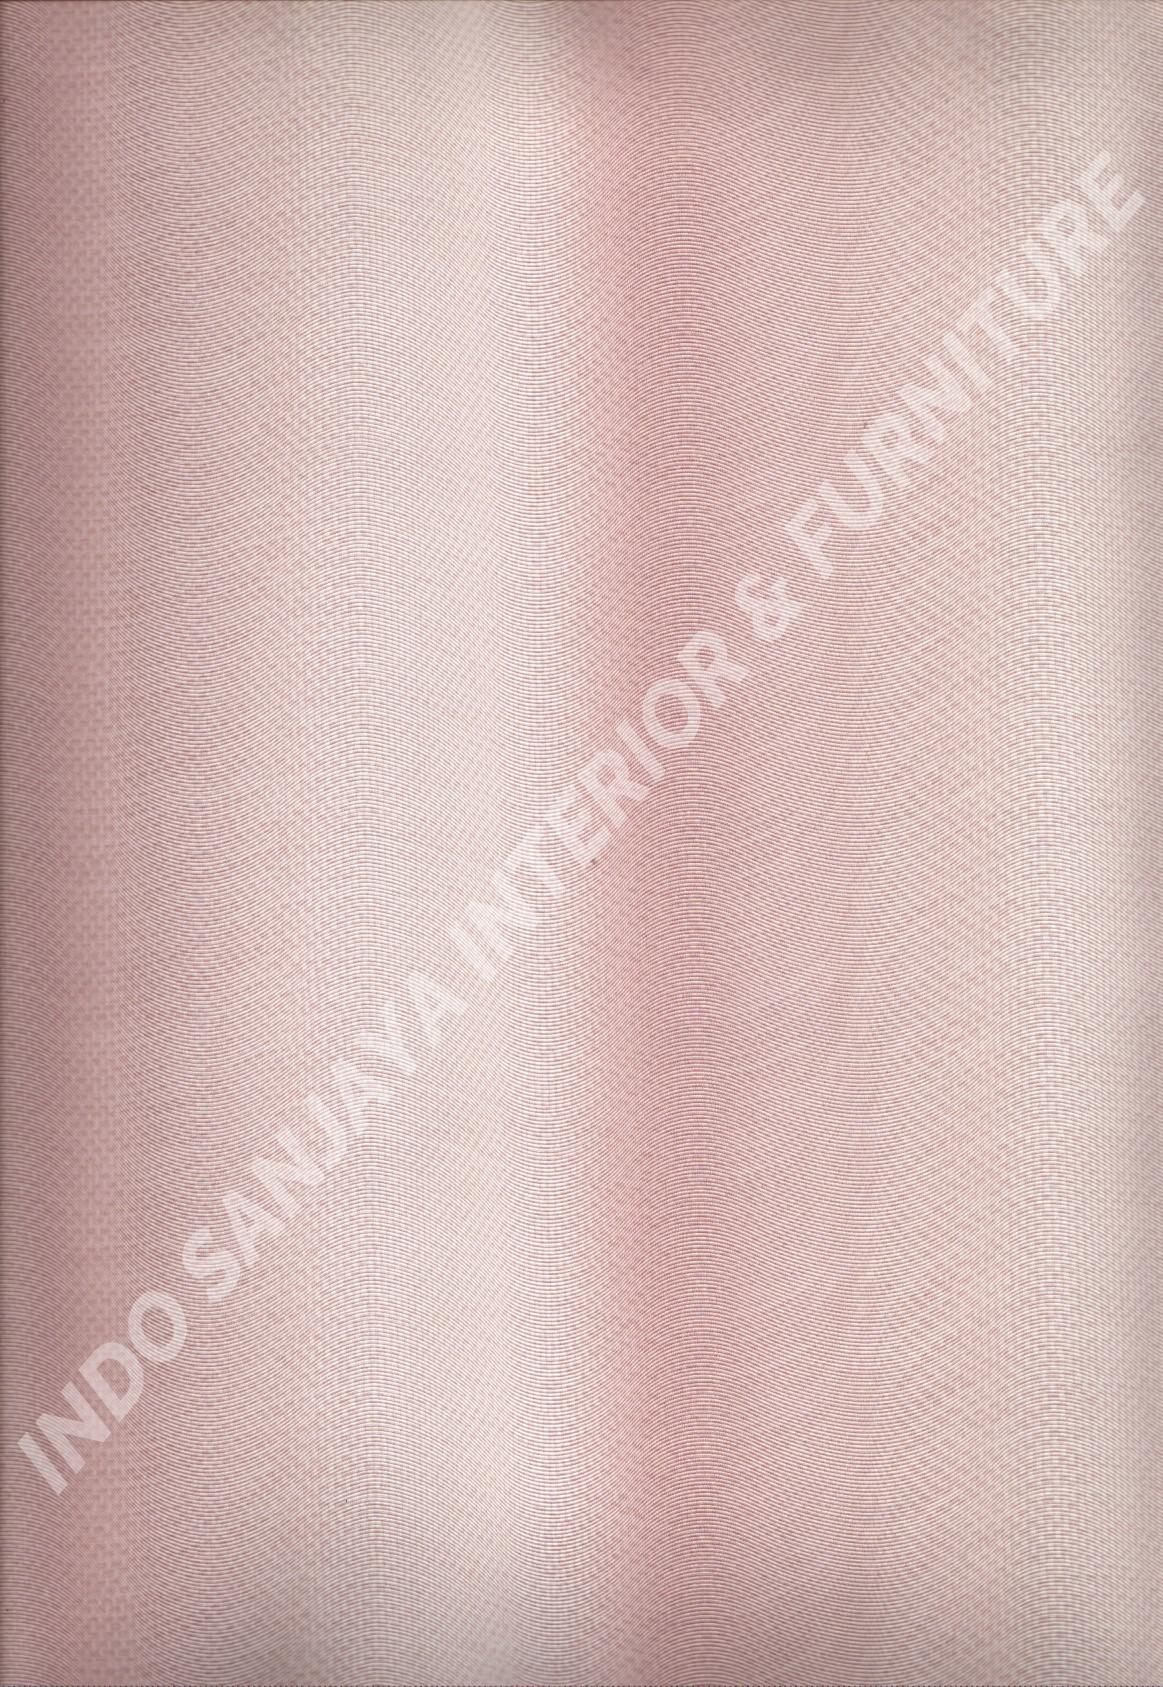 wallpaper   Wallpaper Minimalis Polos 2571-5:2571-5 corak  warna